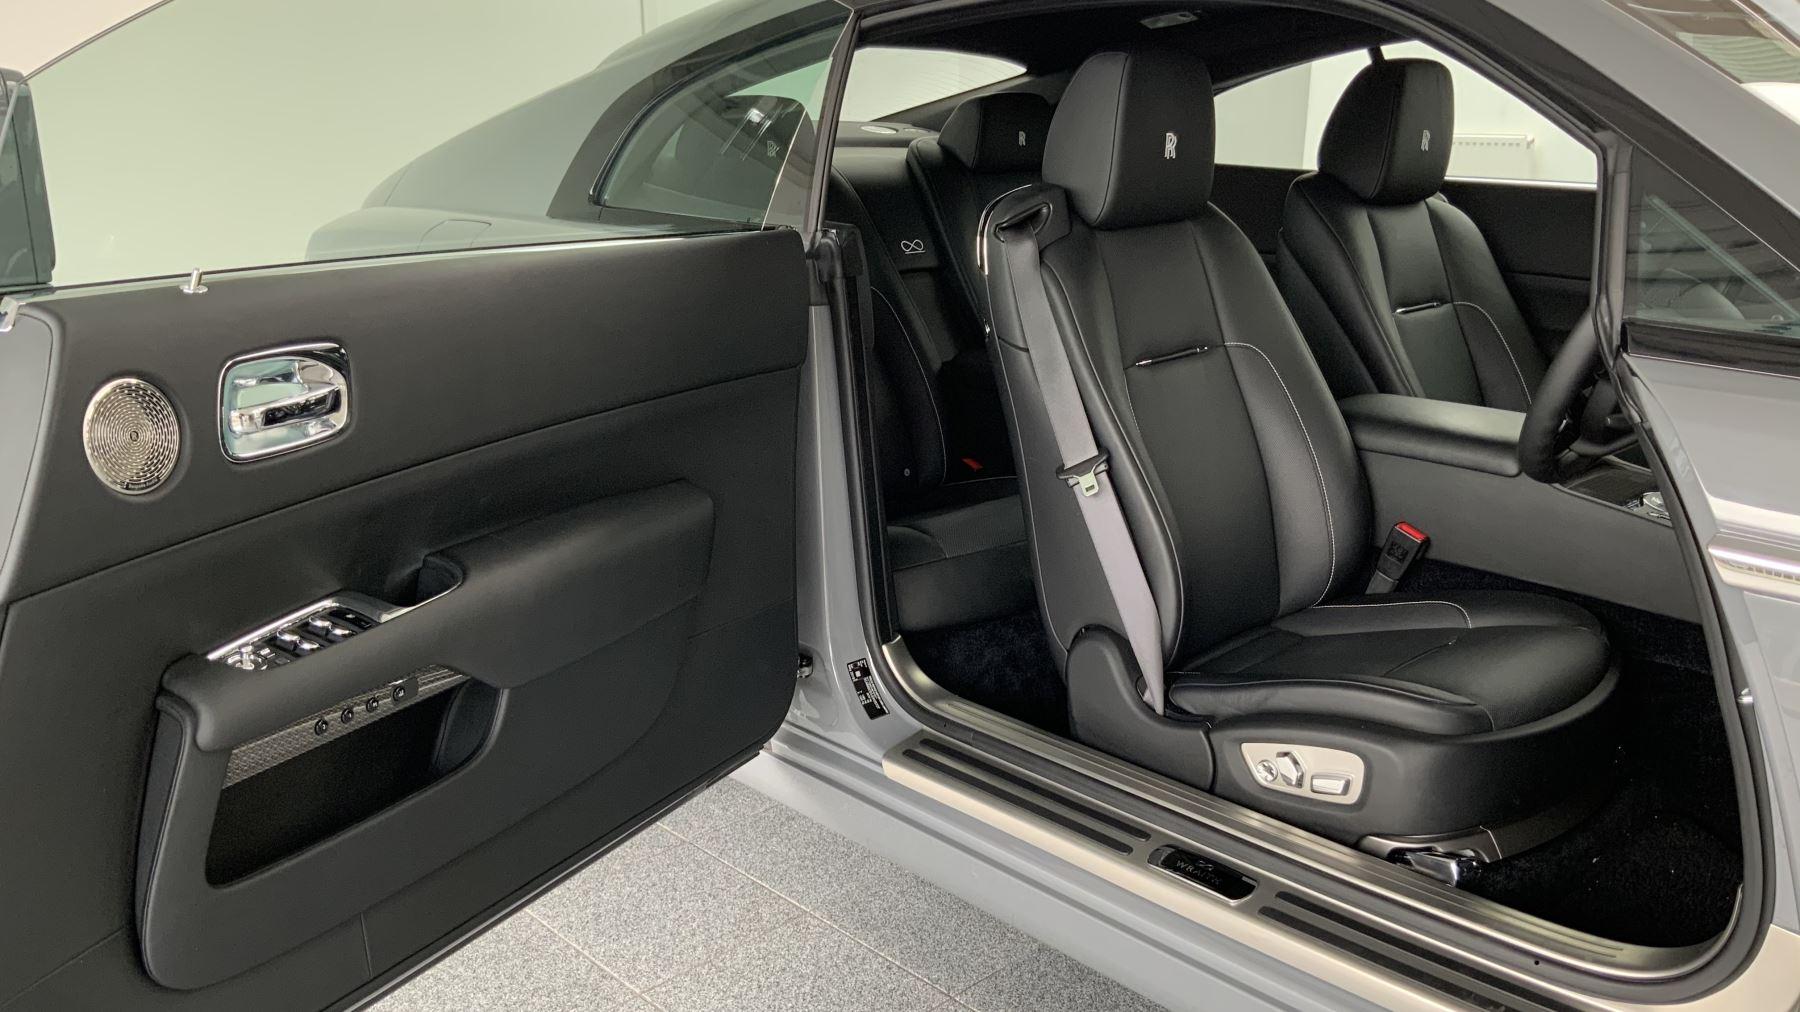 Rolls-Royce Black Badge Wraith V12 image 14